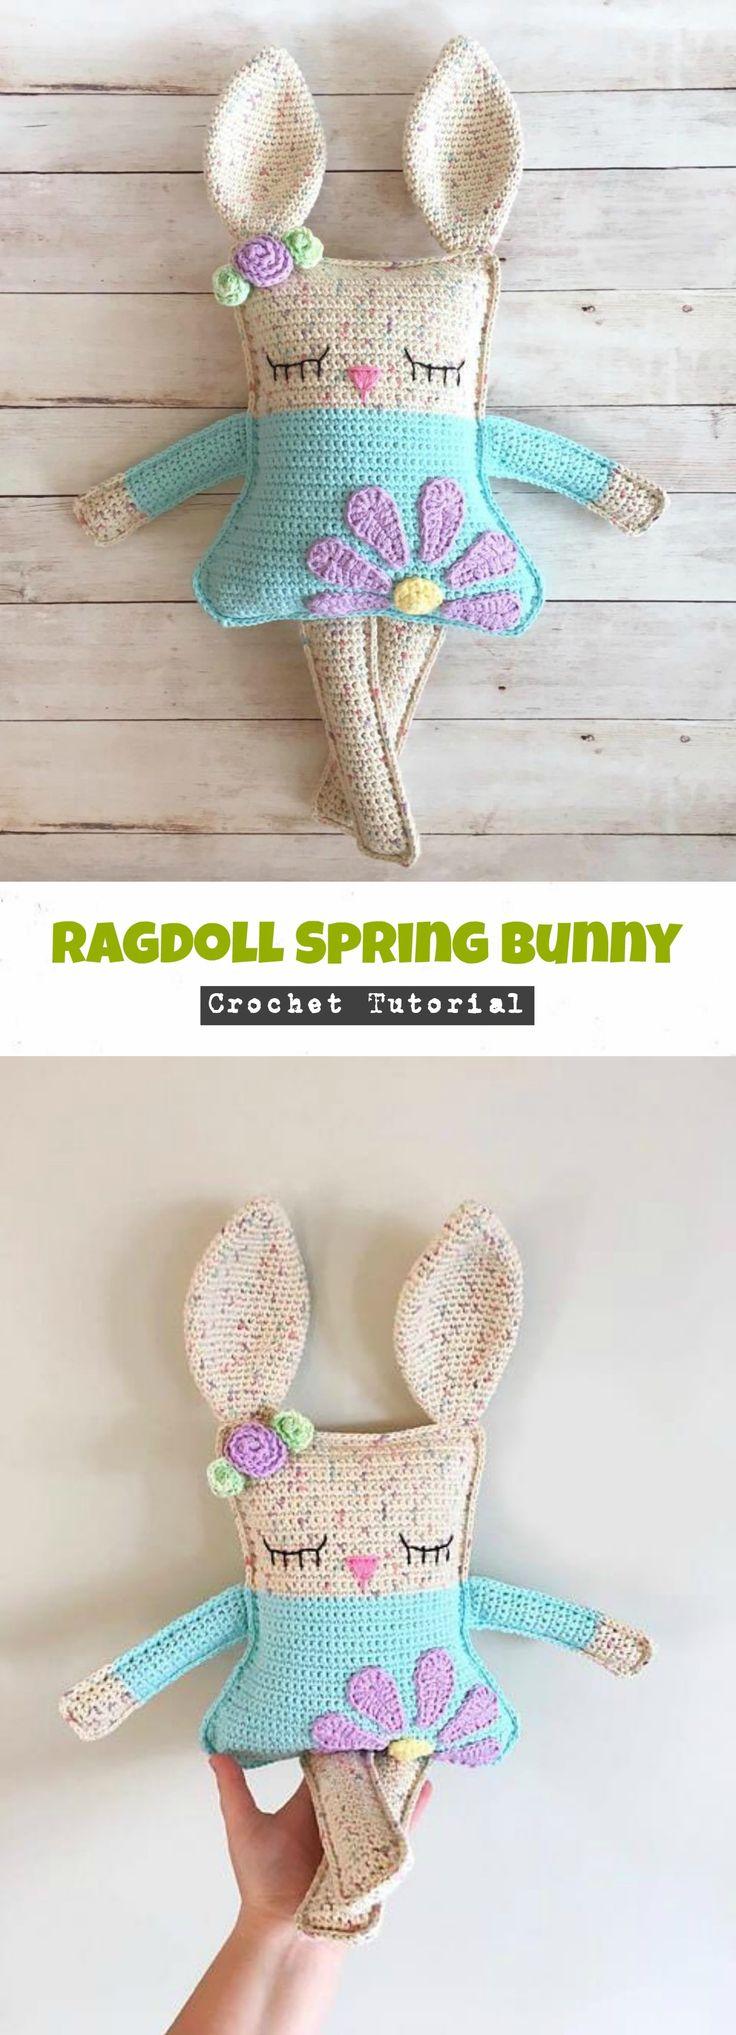 Crochet Ragdoll Spring Bunny